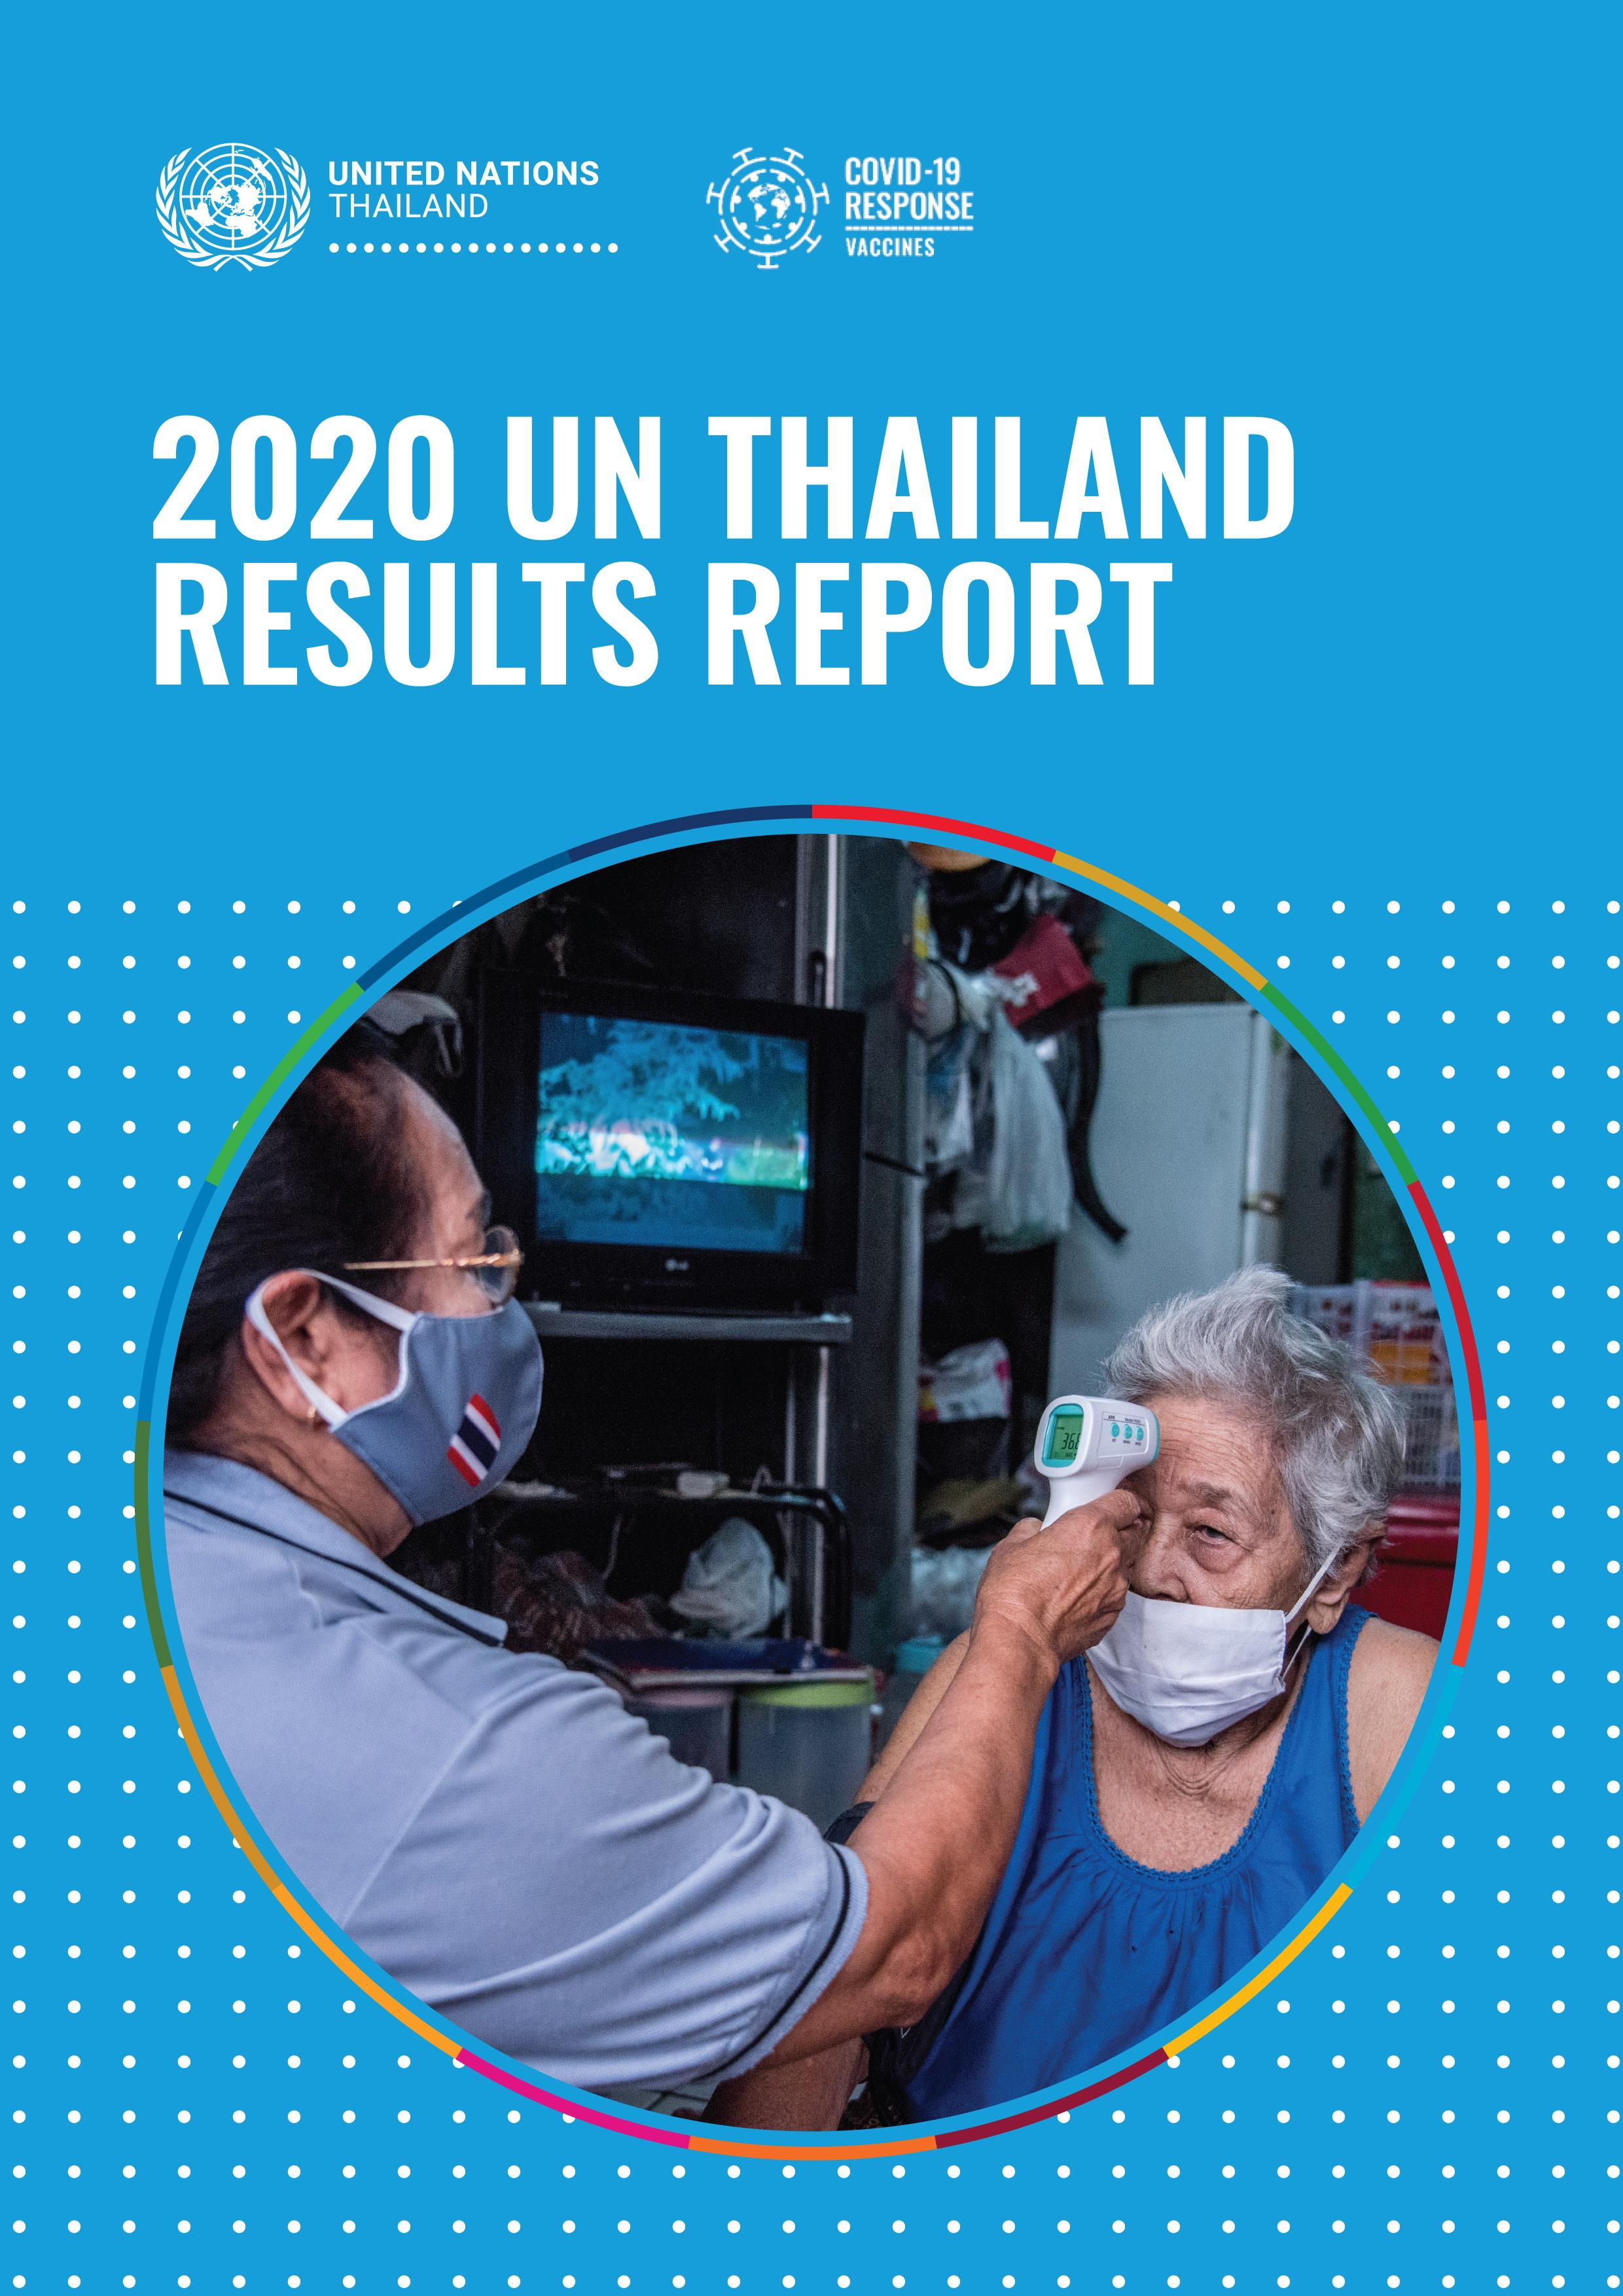 2020 UN Thailand Results Report